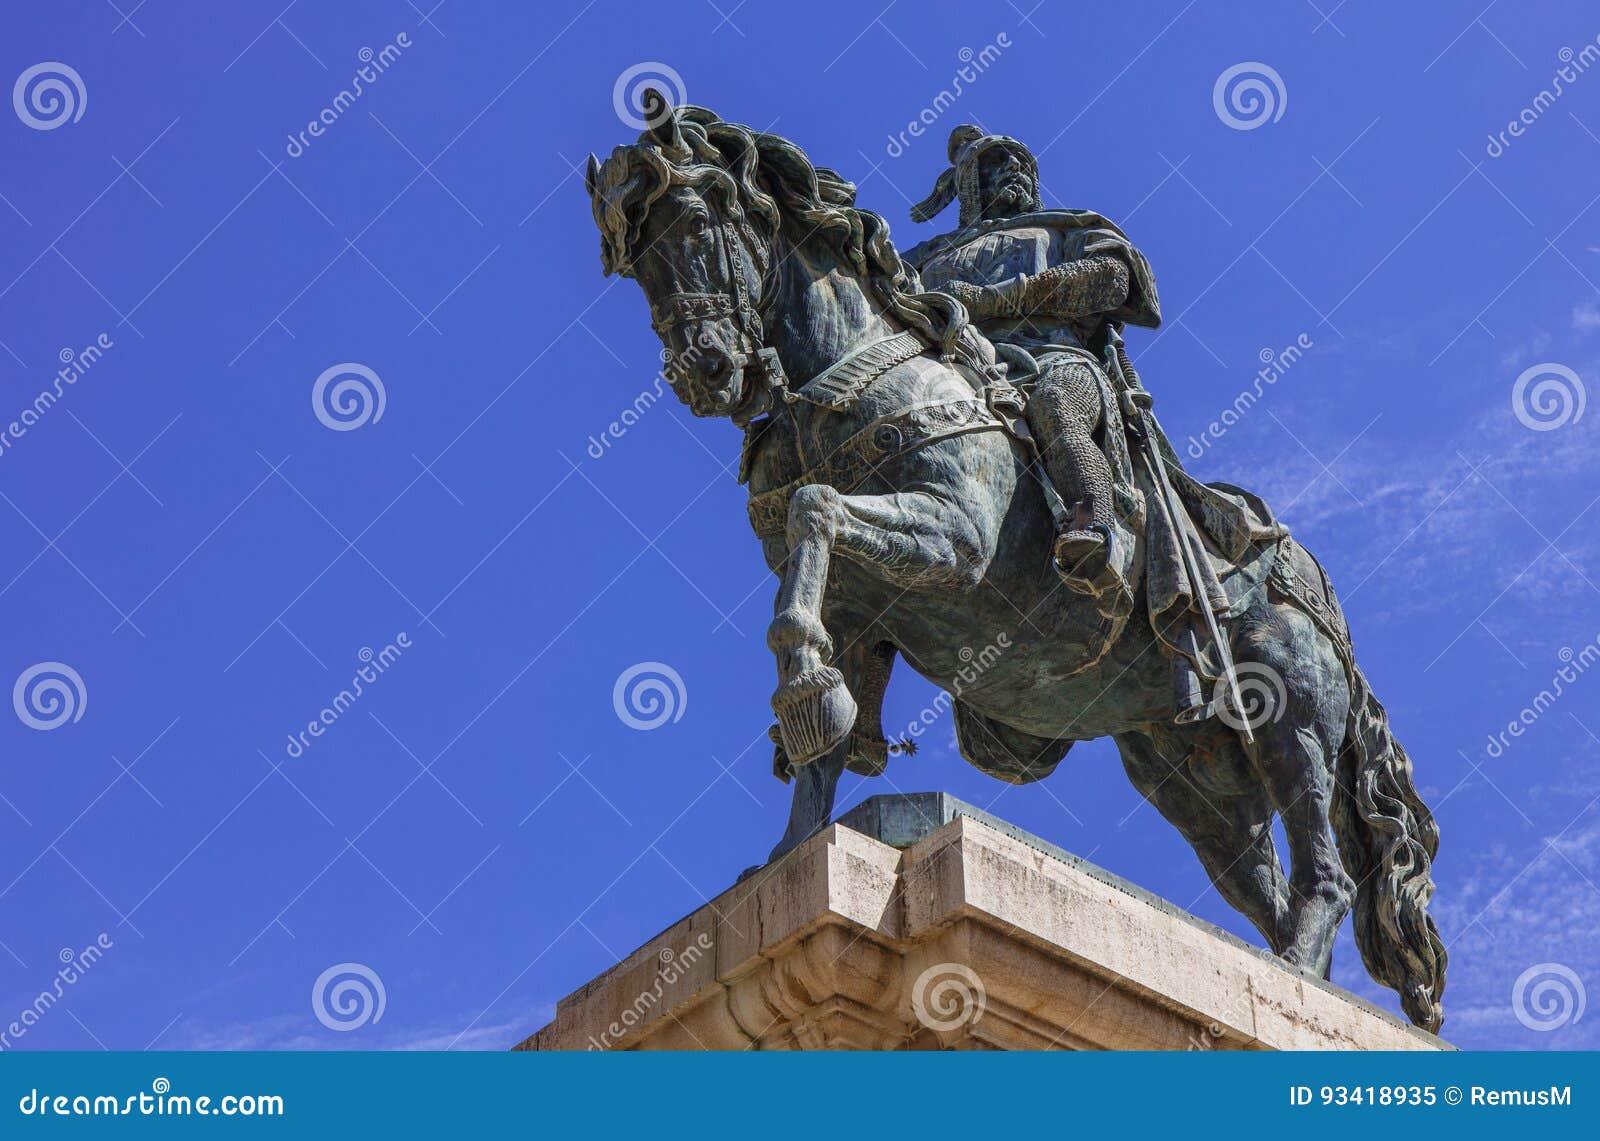 Cid el bohatera spanish